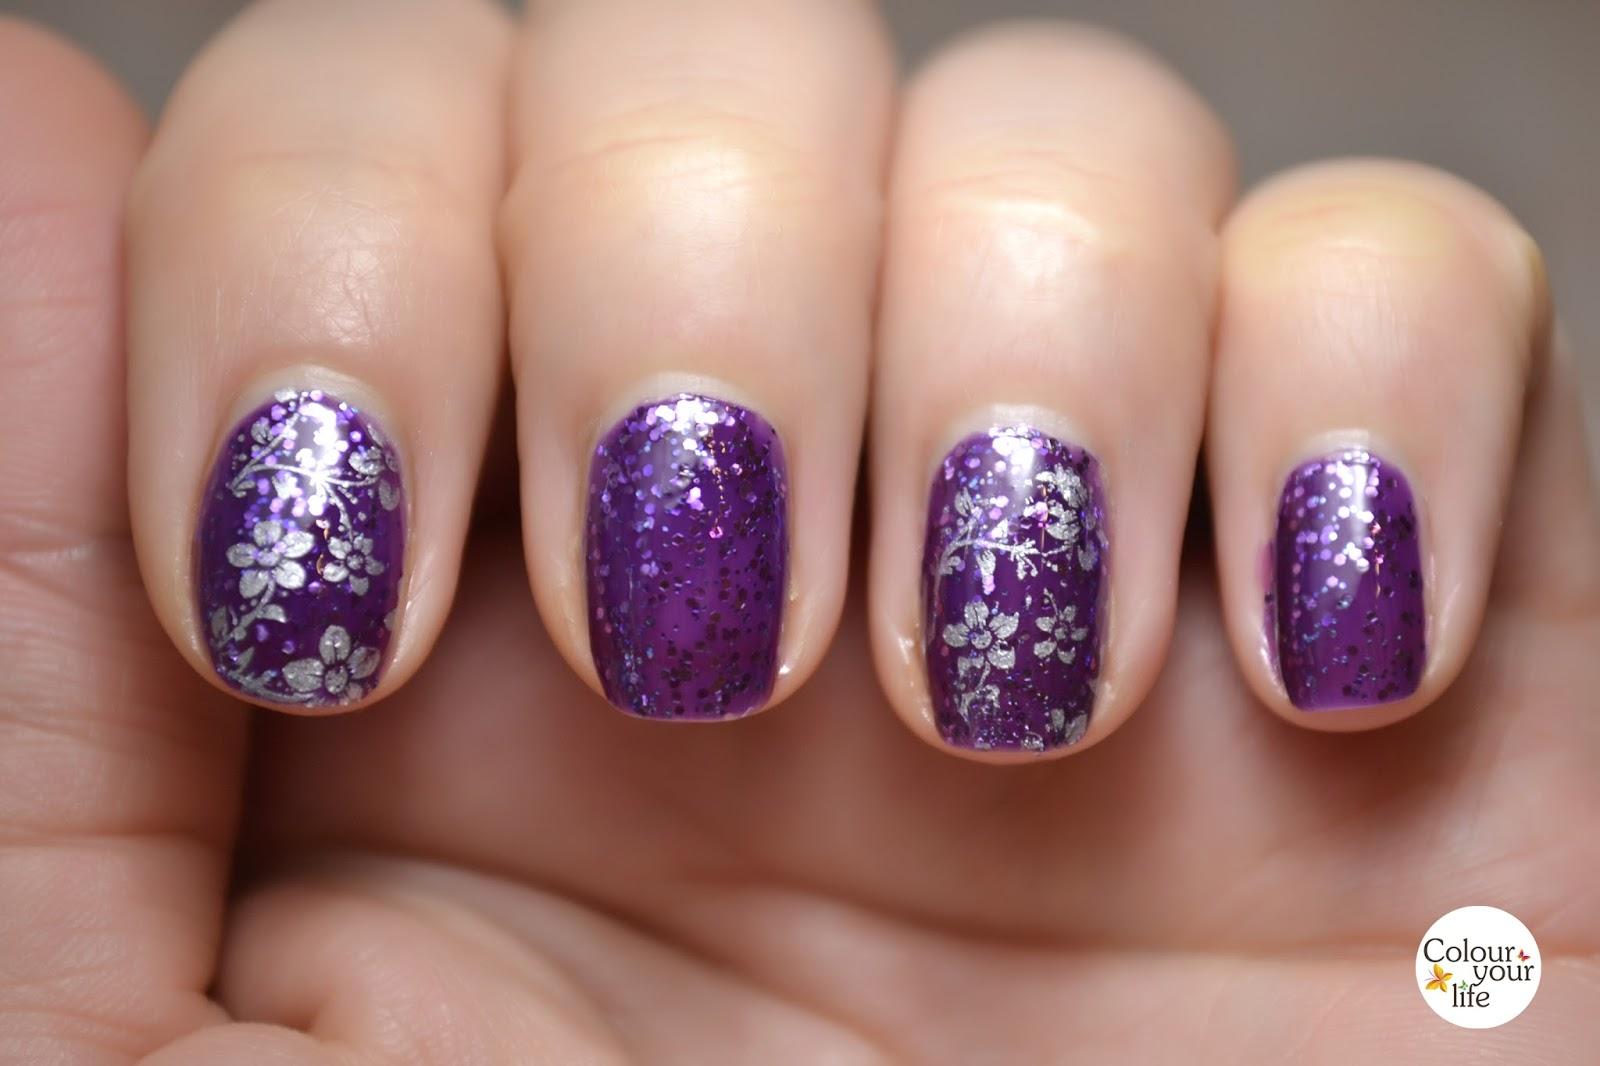 Glitter Polish on my Nails